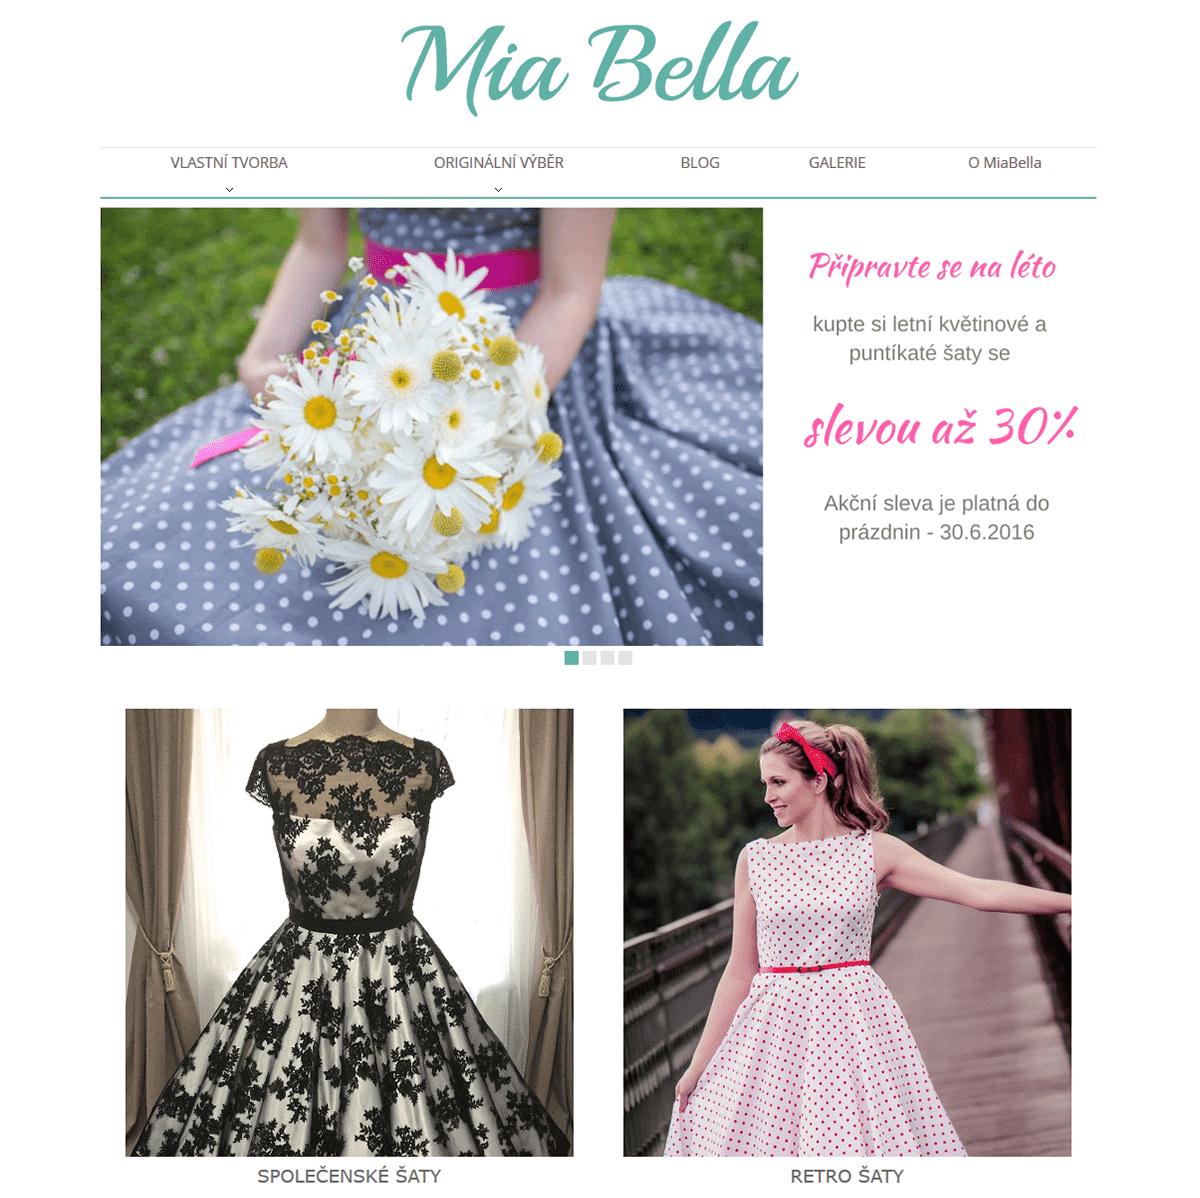 Retro móda od Mia Bella